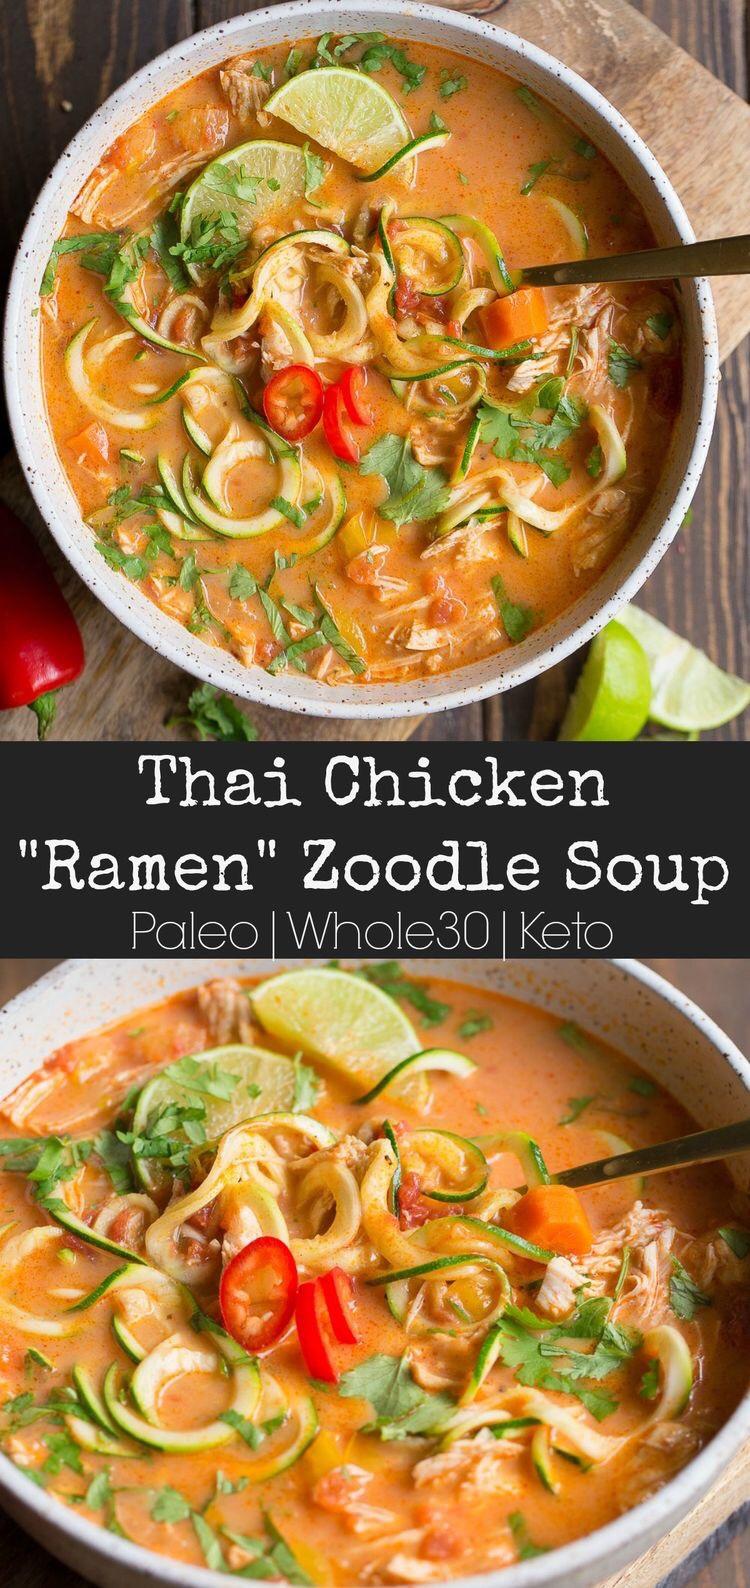 7 Best Low Carb Keto Zoodle (Zucchini Noodle) Soup Recipes - Keto Whoa #zucchininoodles